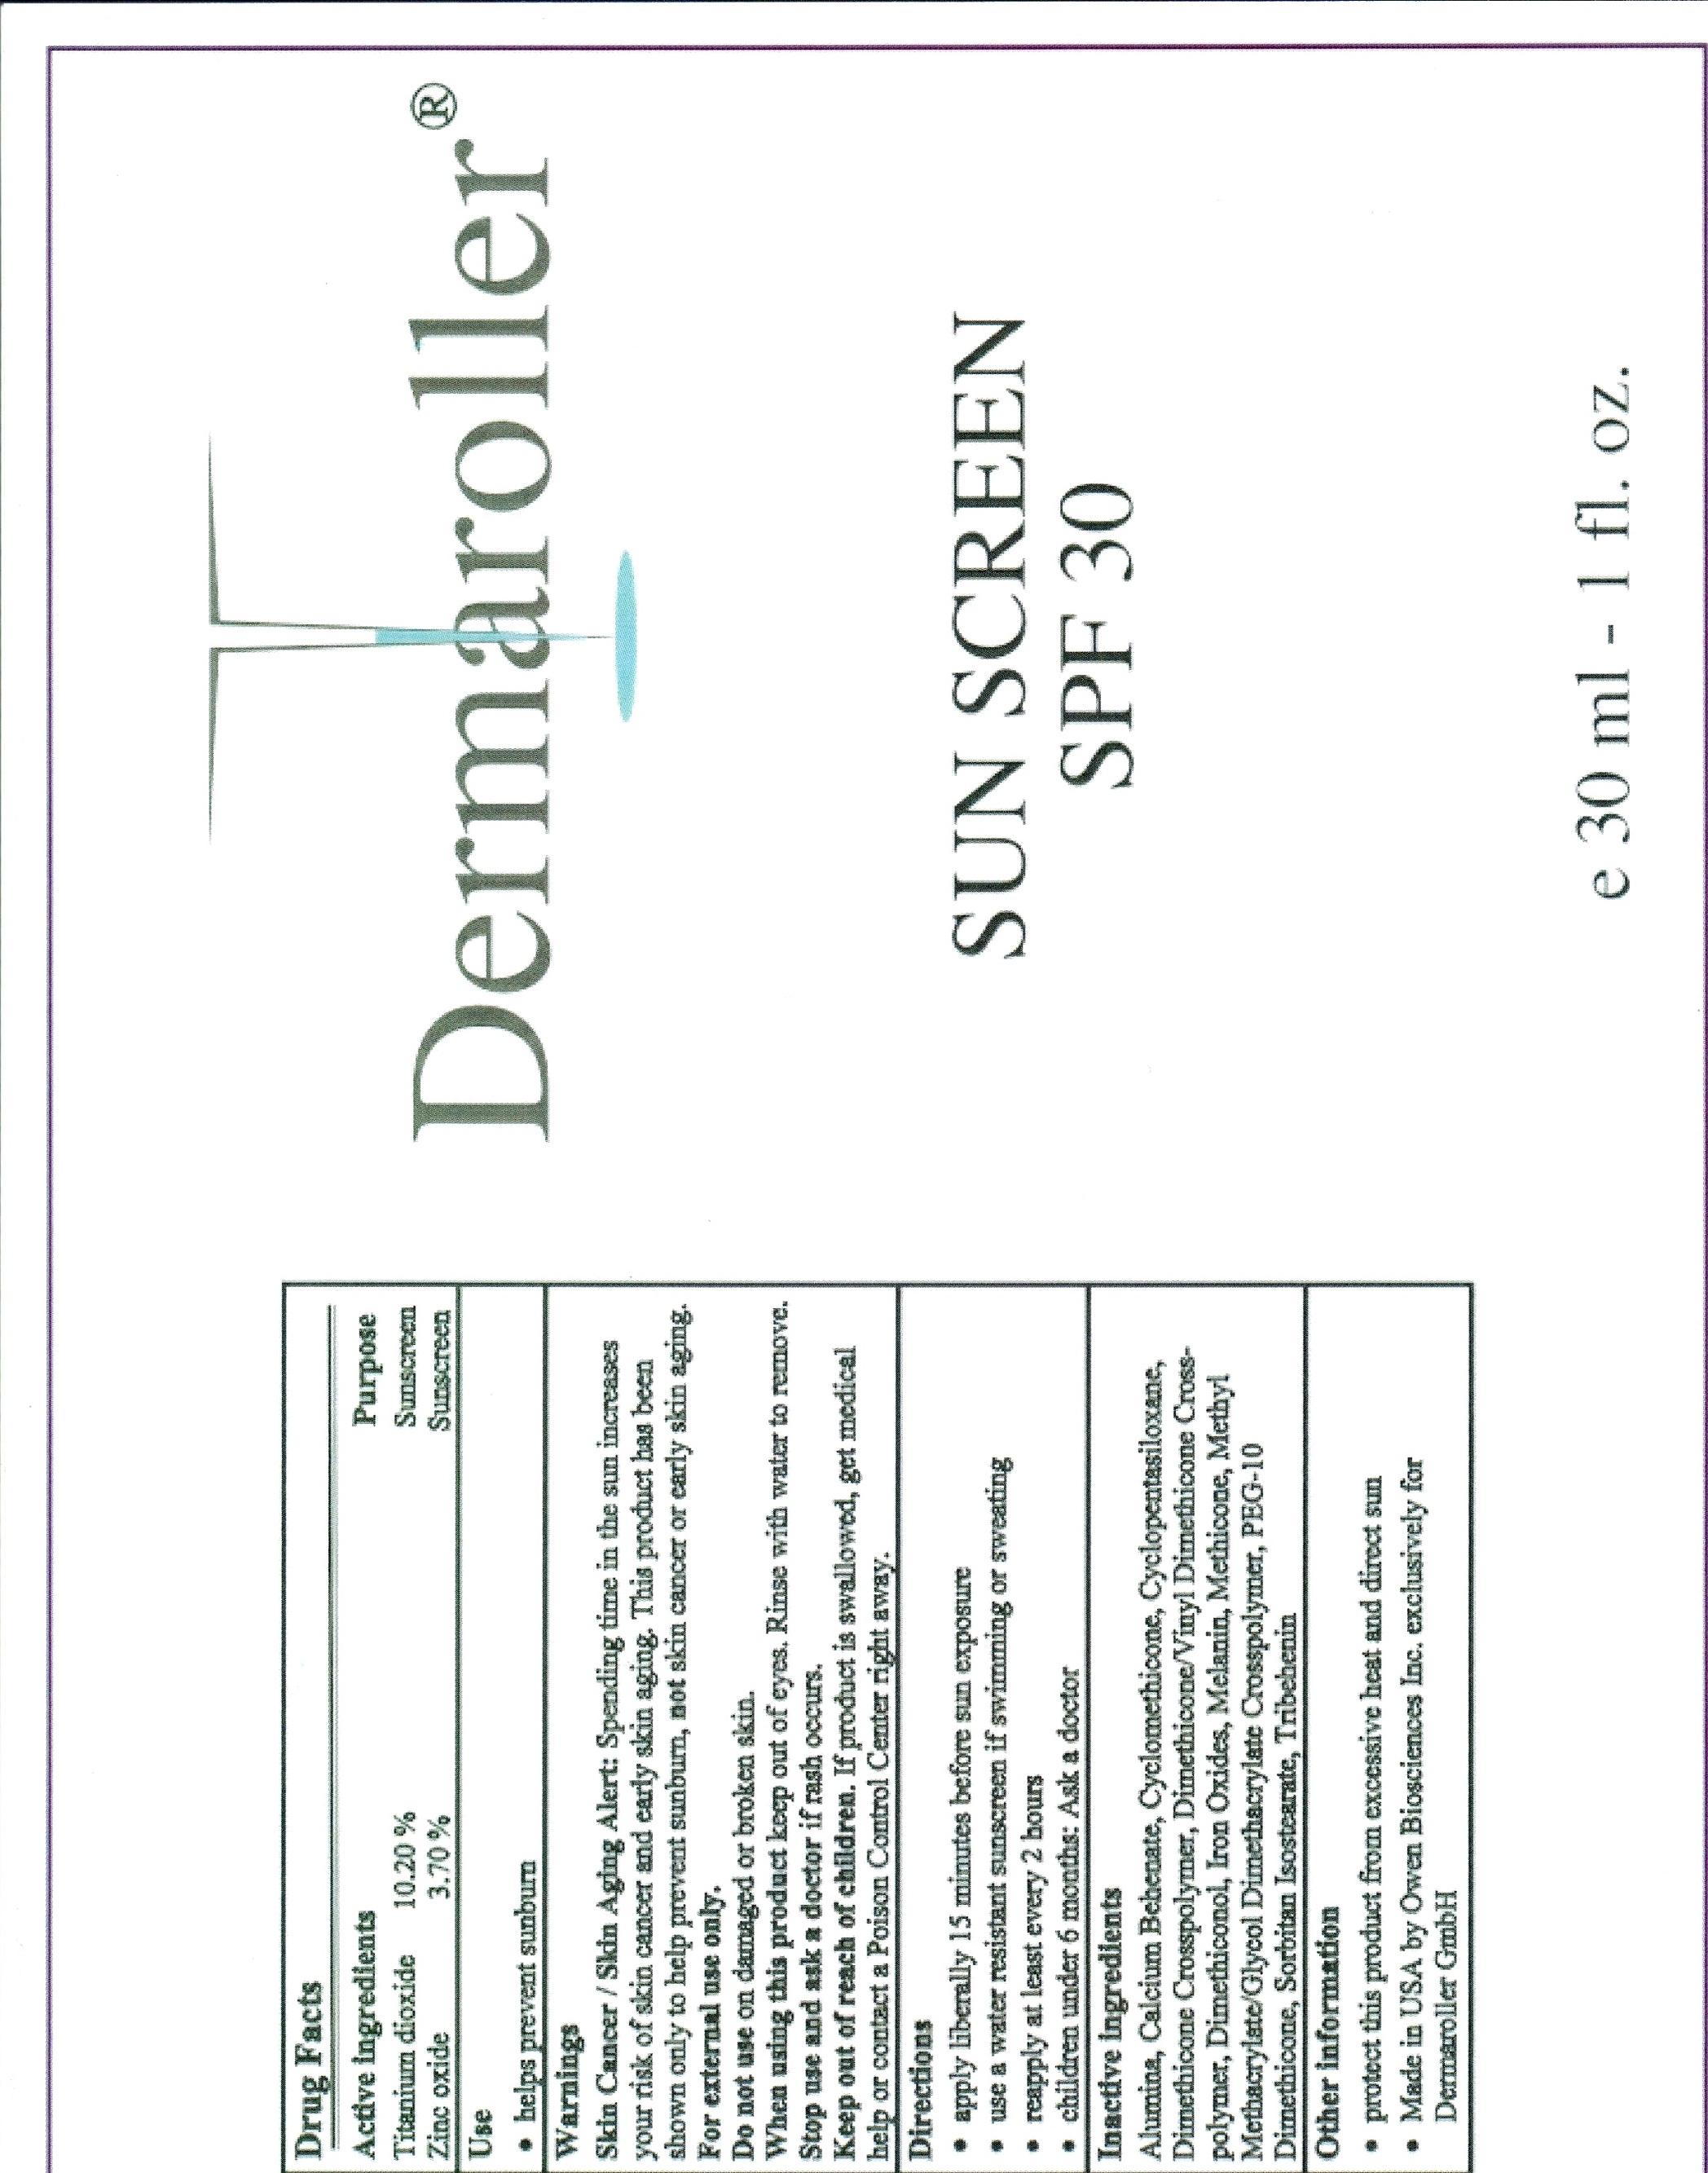 Anhydrous Spf 30 (Titanium Dioxide, Zinc Oxide) Cream [Owen Biosciences, Inc.]